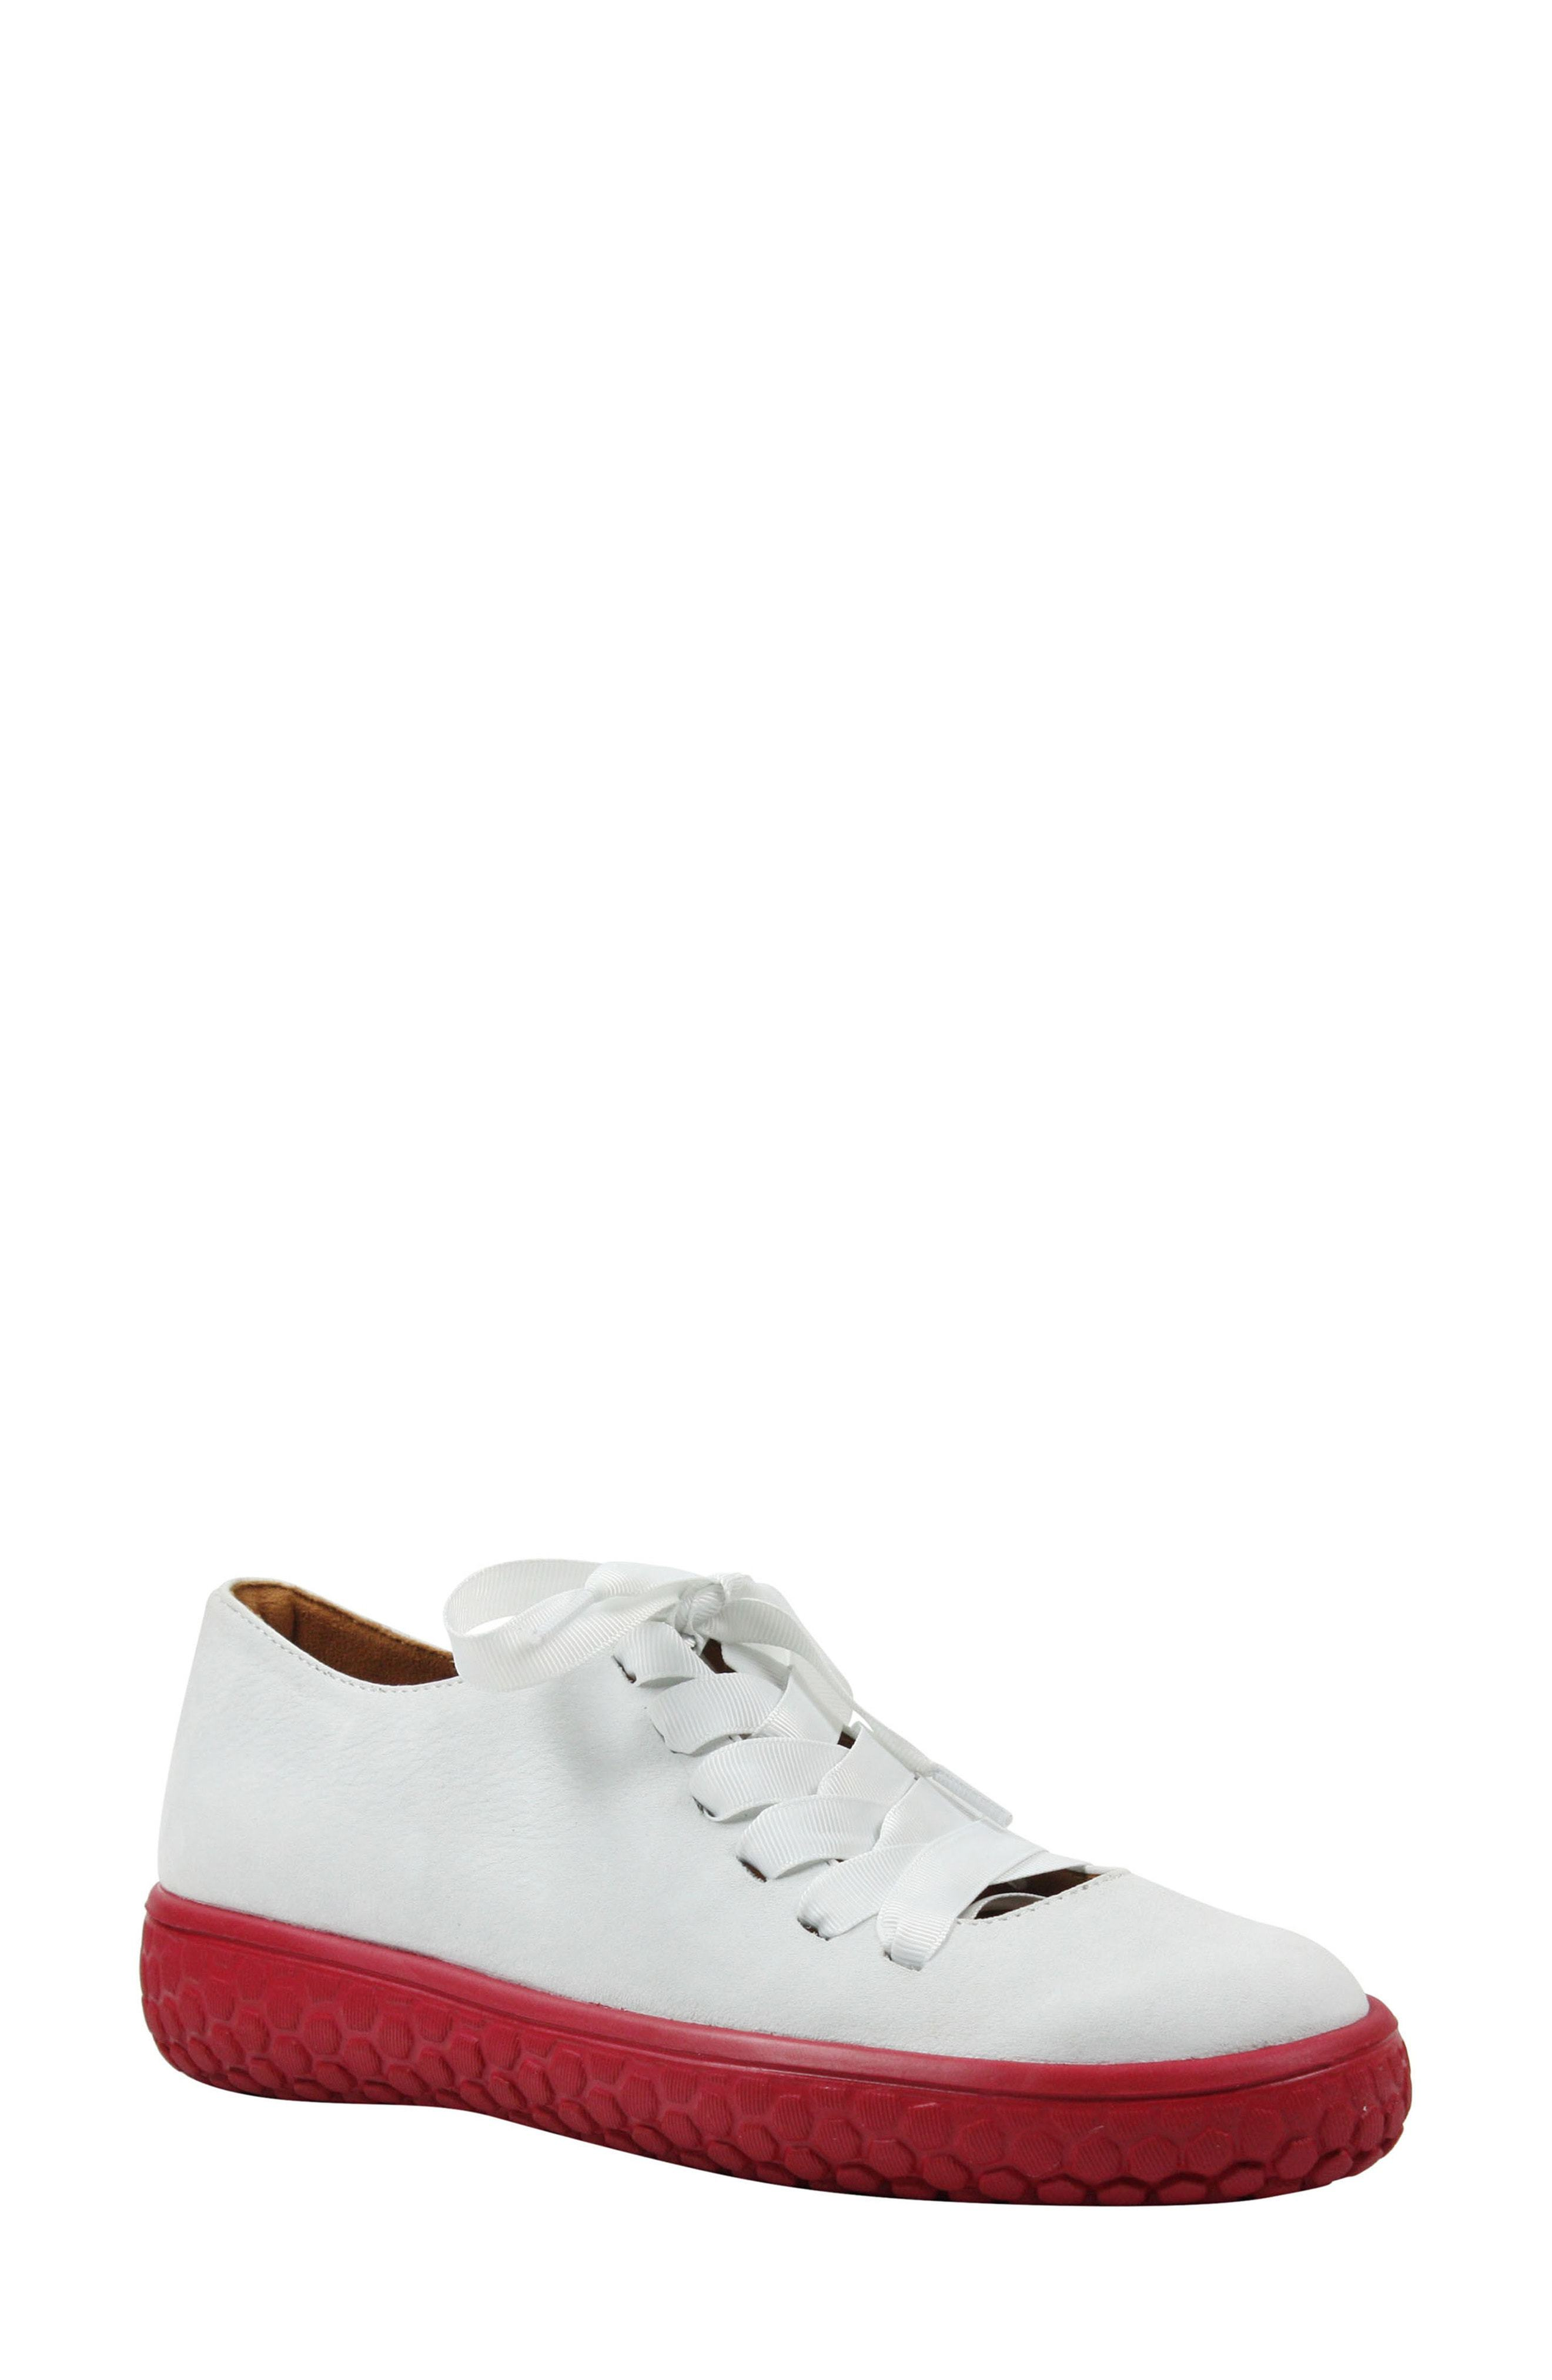 L'Amour des Pieds Zaheera Sneaker